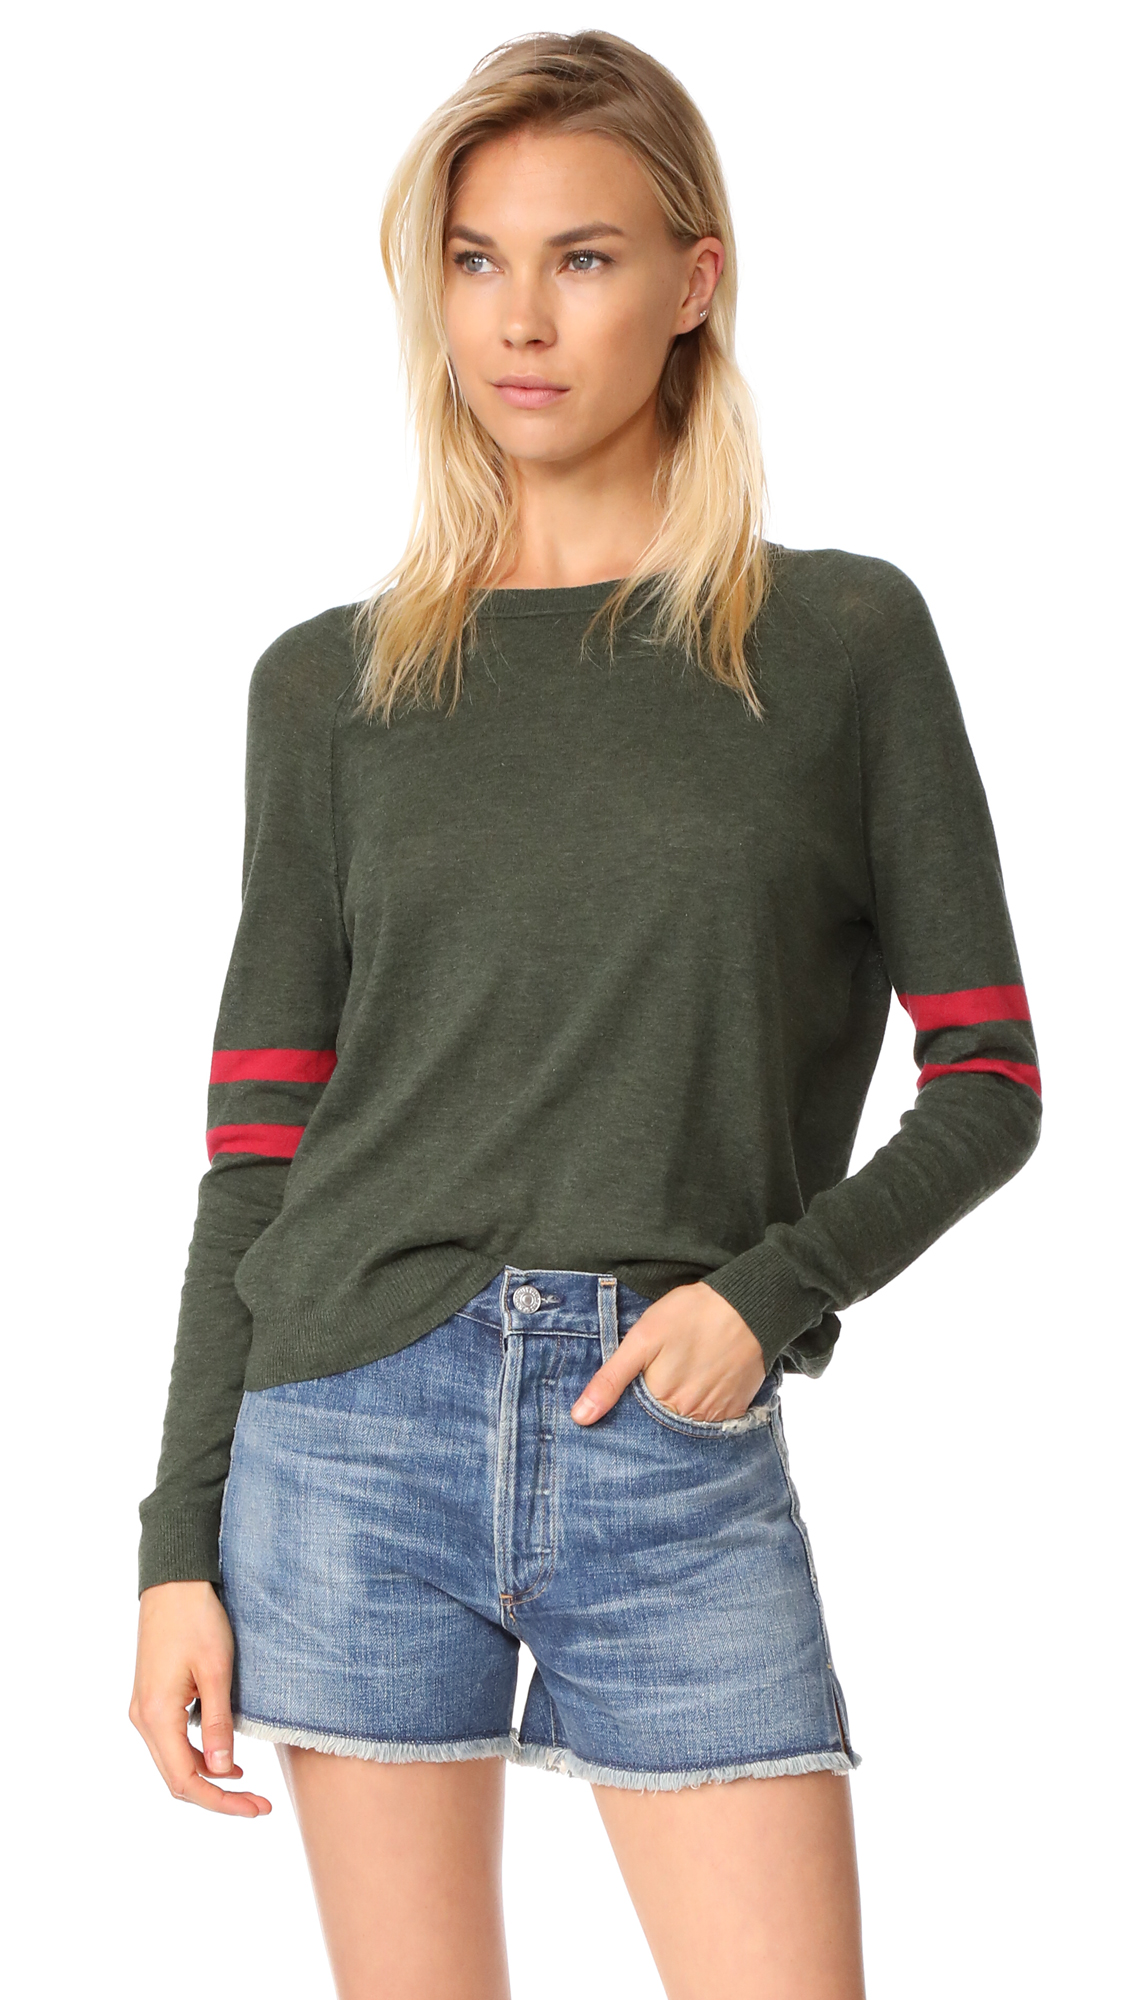 Velvet Theana Sweater In Army